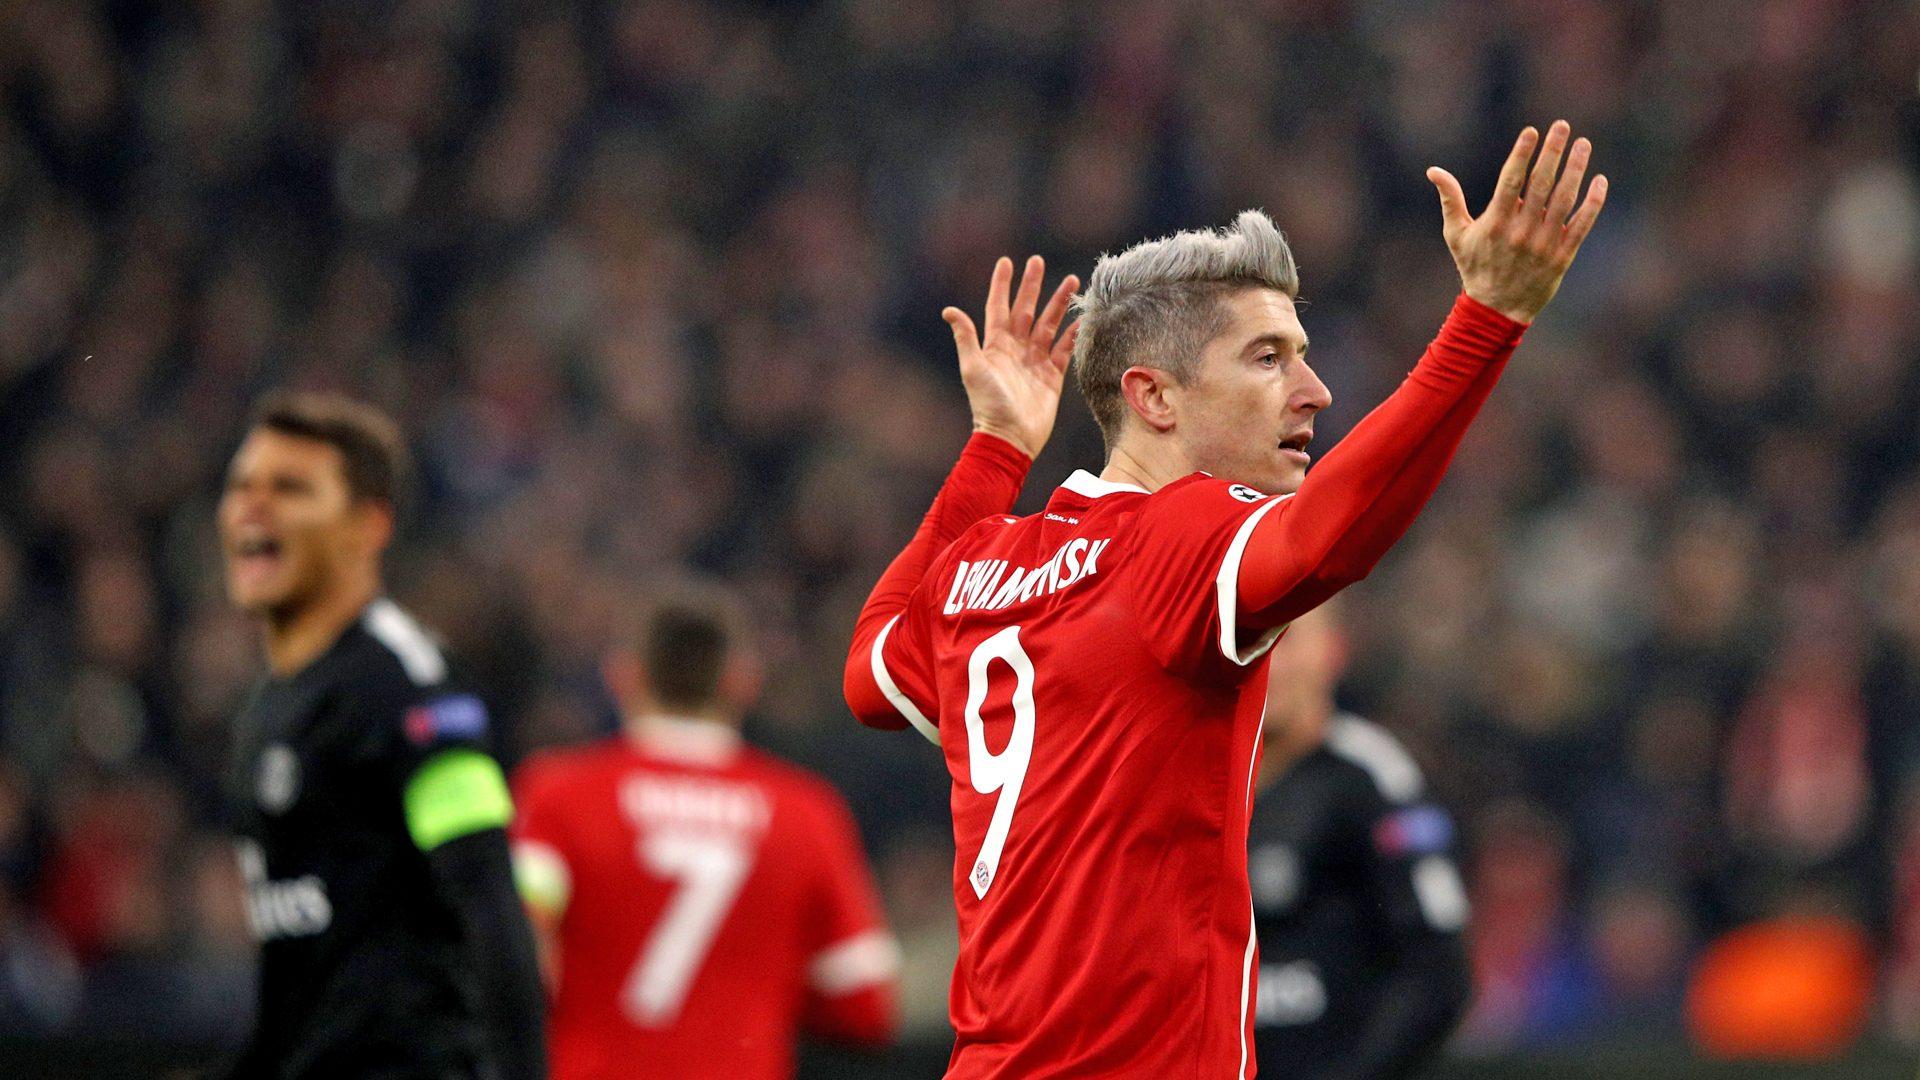 bundesliga 5 reasons bayern munich will beat paris saint germain in the uefa champions league final